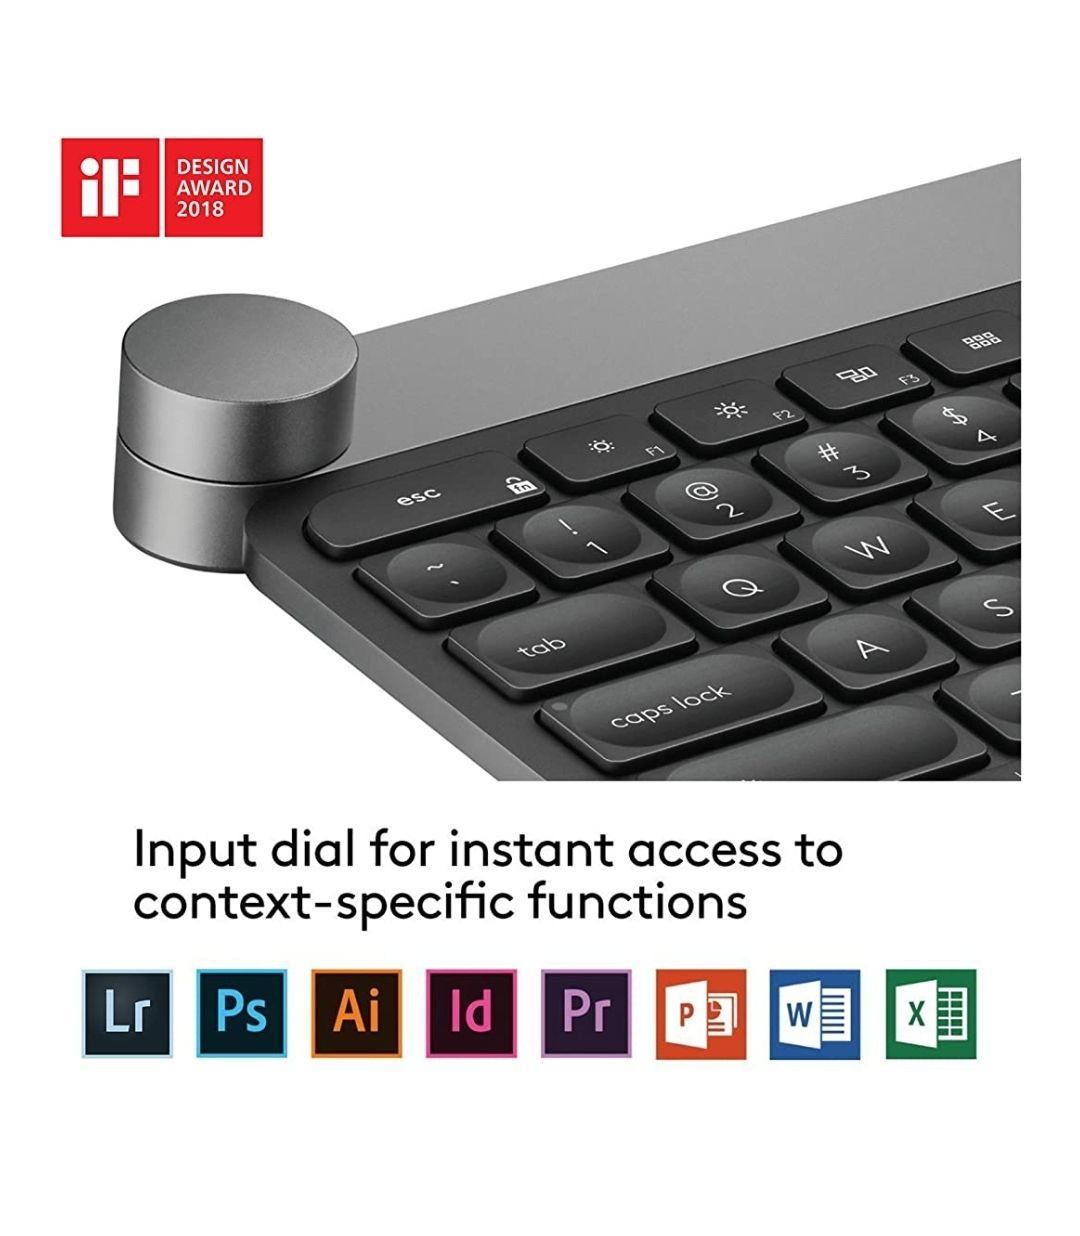 Logitech Craft - UK English and Adobe Creative Cloud - £134.25